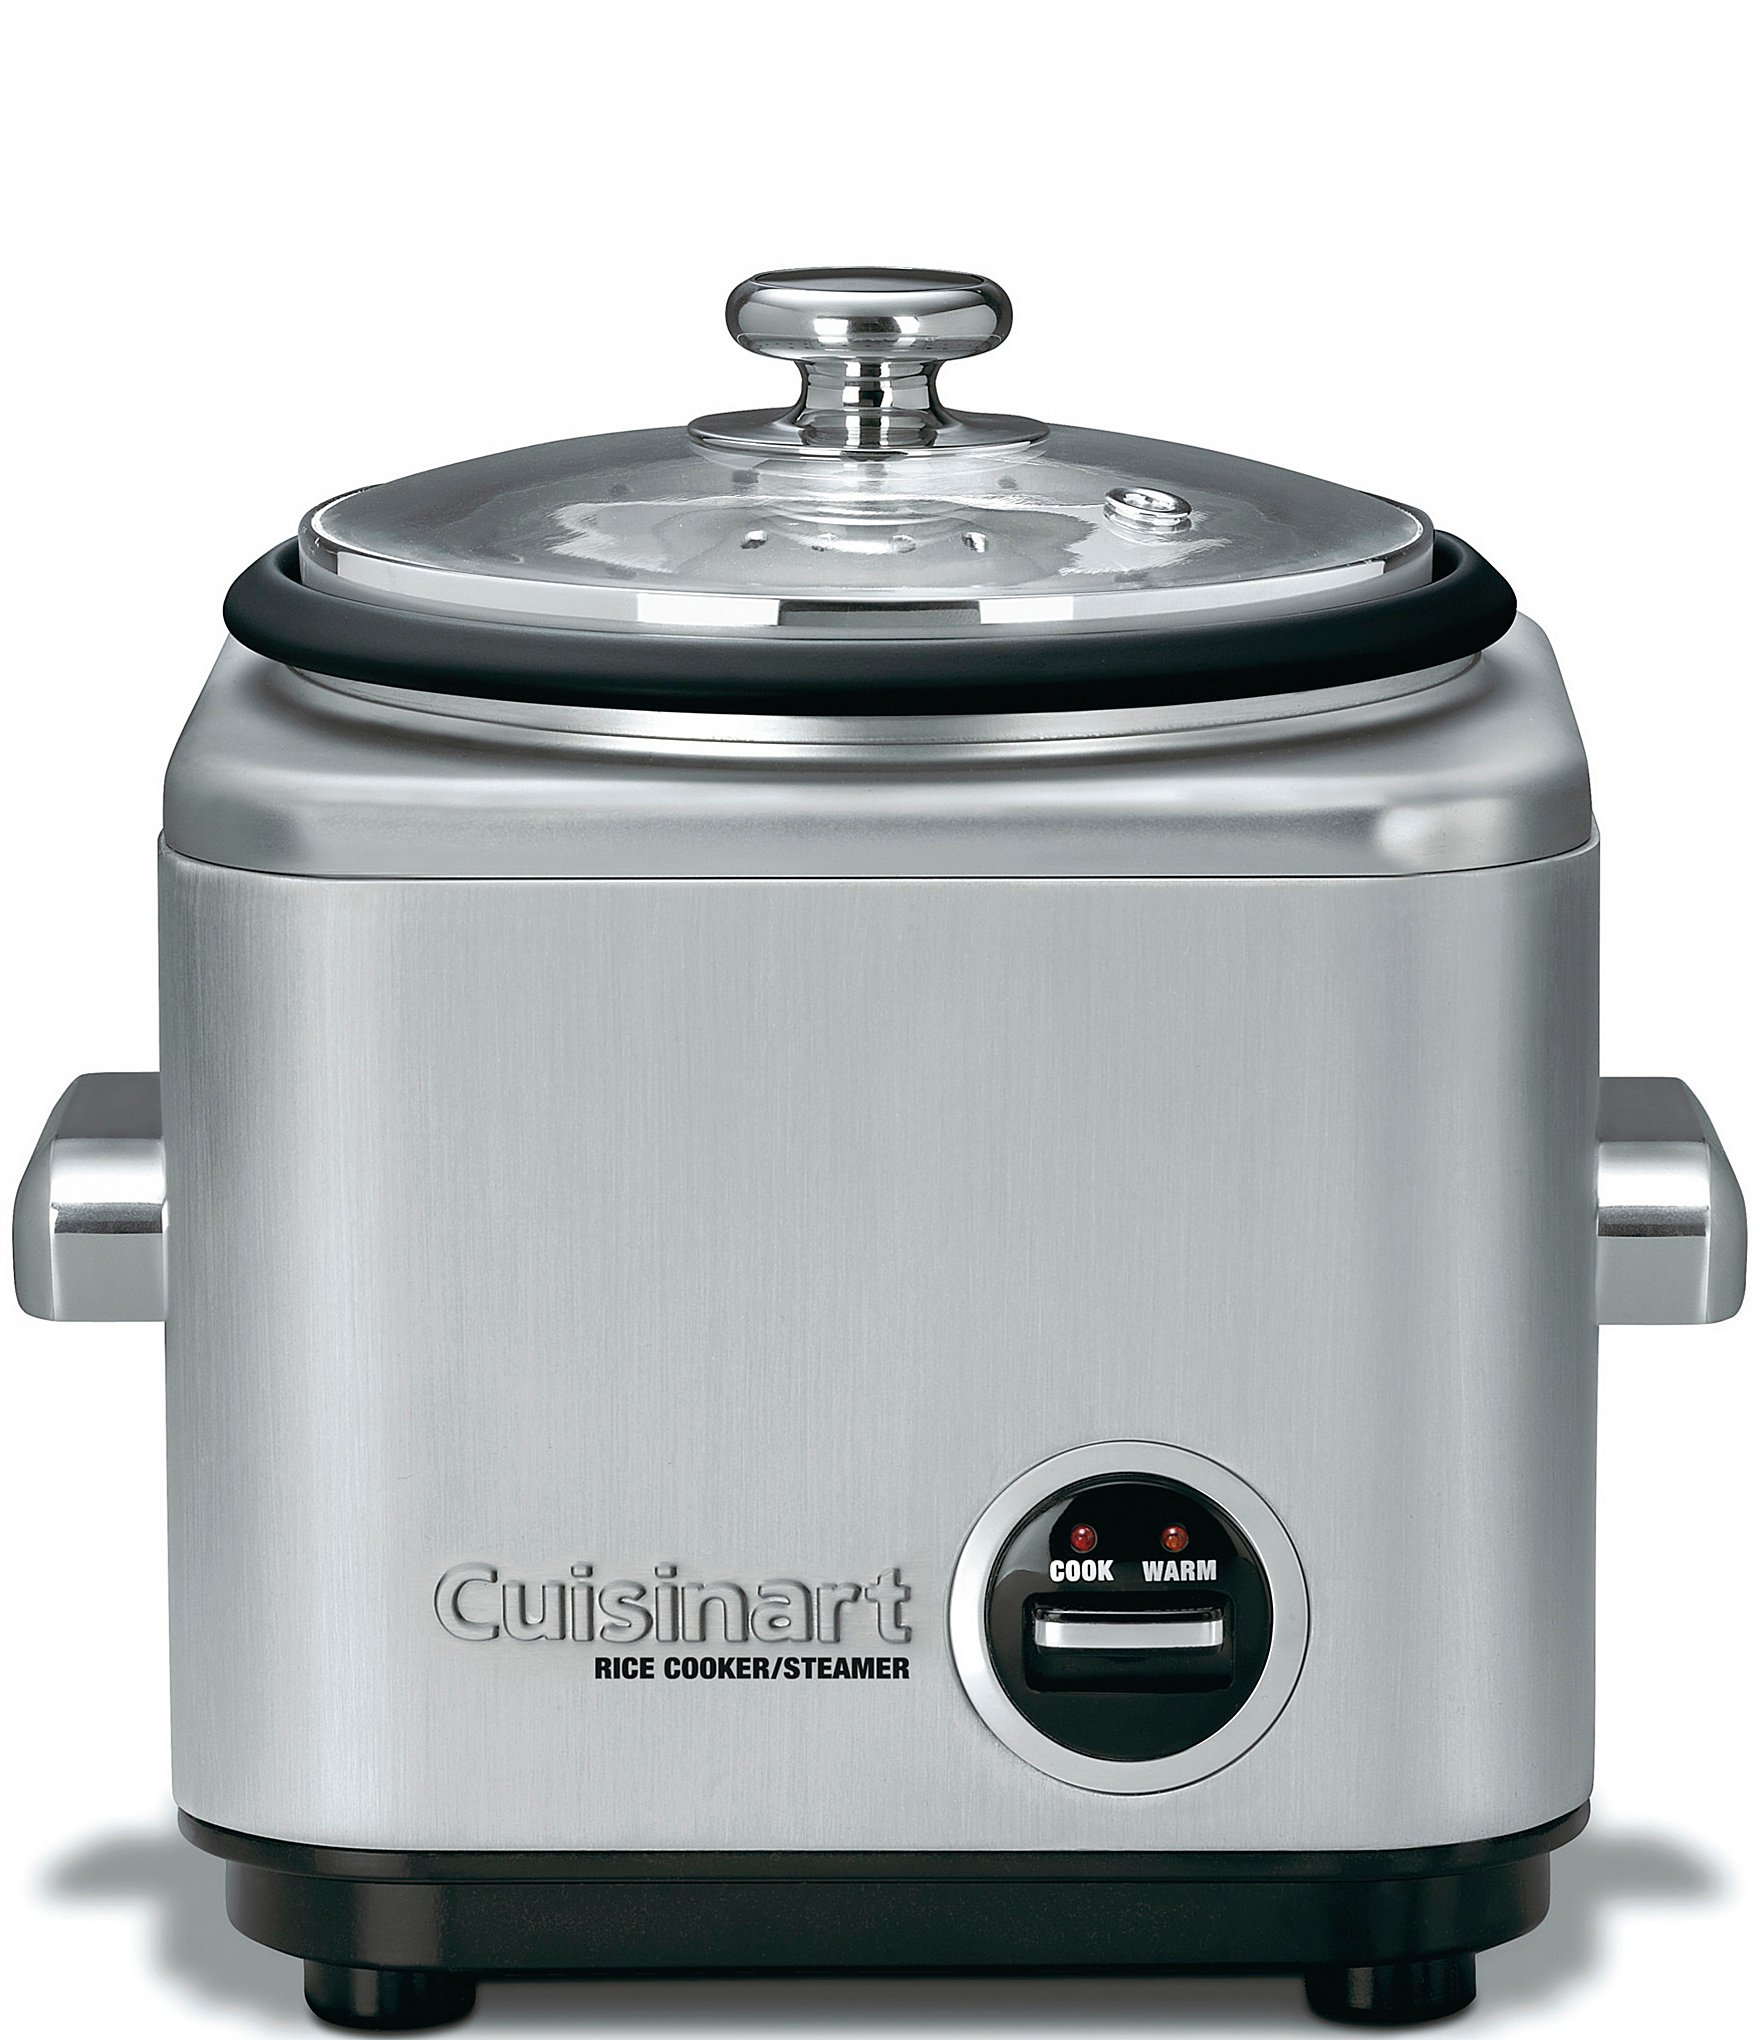 Cuisinart Stainless Steel Rice Cooker Dillards